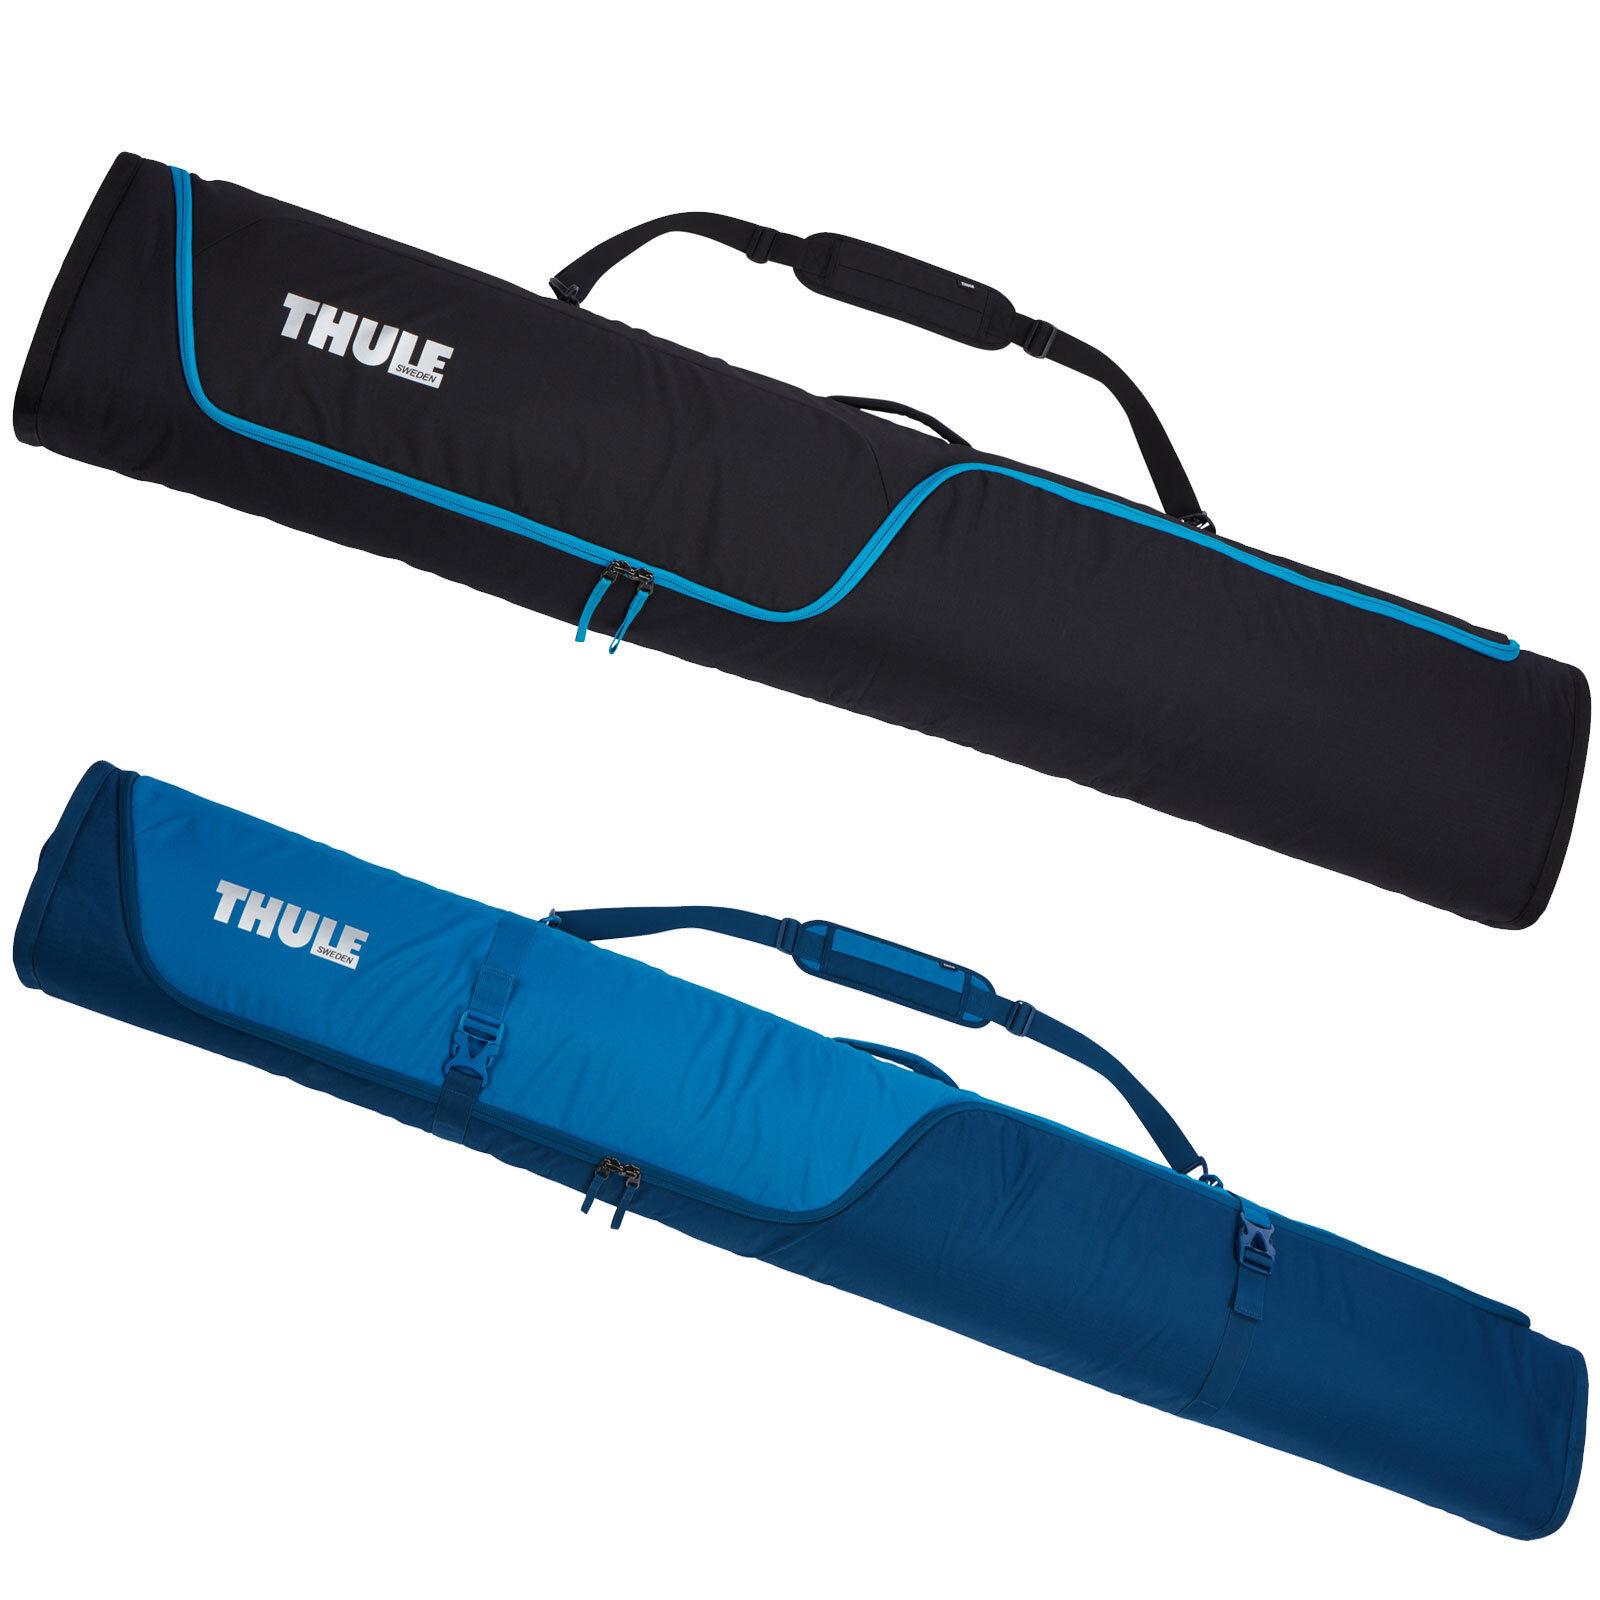 Thule Snowboard Bag Snowboard-Transporttasche Board-Bag Snowboard Bag 165 Cm